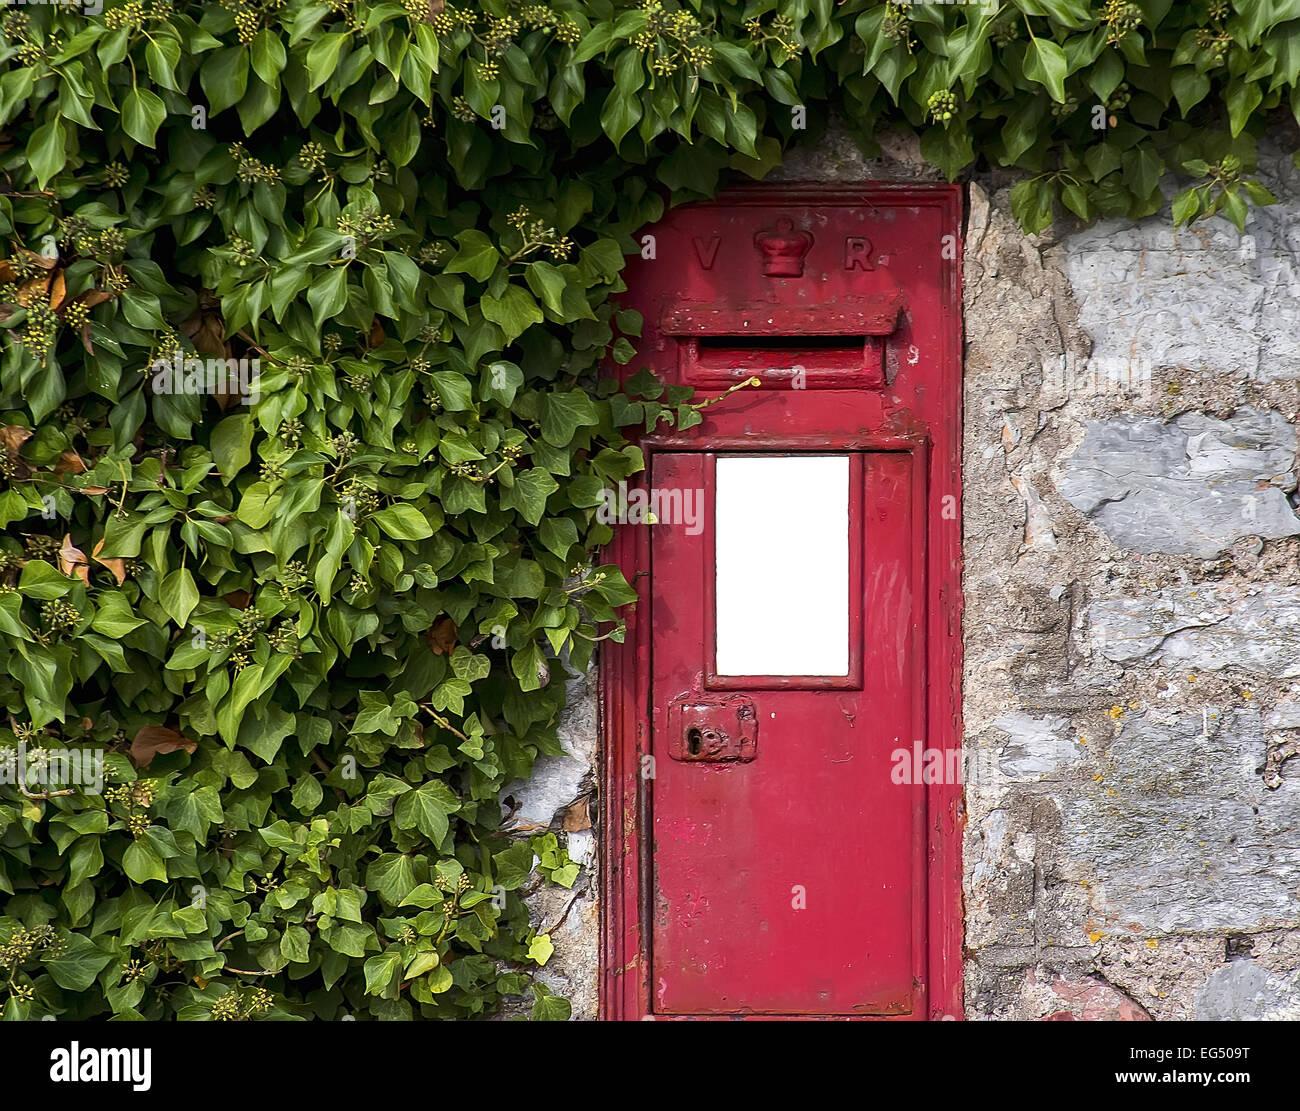 mailbox,uk,postal service,old,wall,retro,symbol,British Culture,English Culture,letter - Stock Image